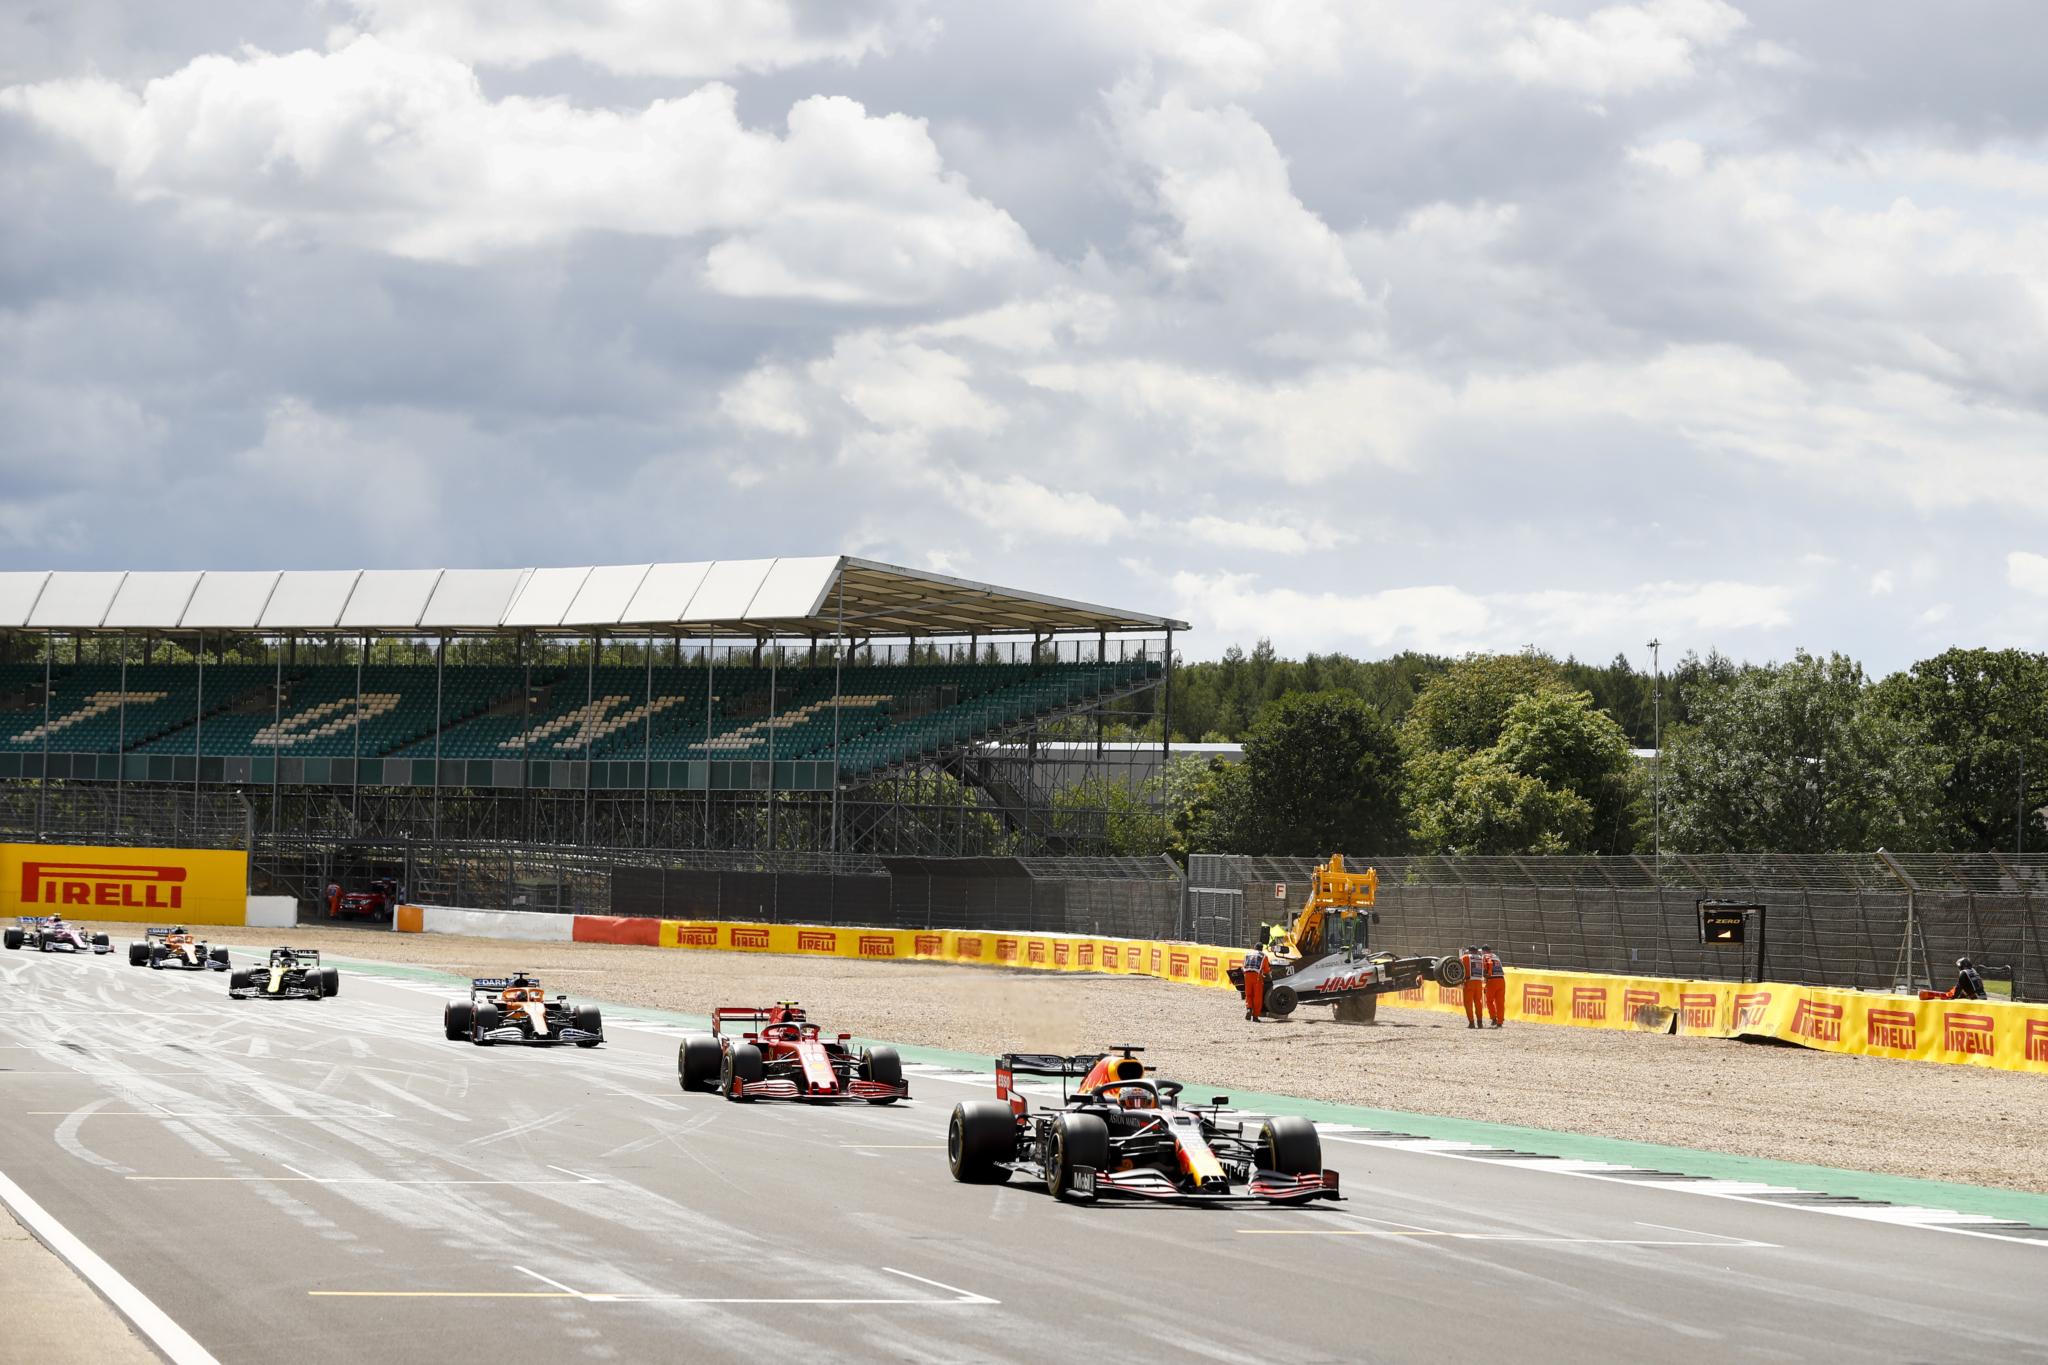 Pirelli 'investigating' failed tyres after dramatic Silverstone British Grand Prix